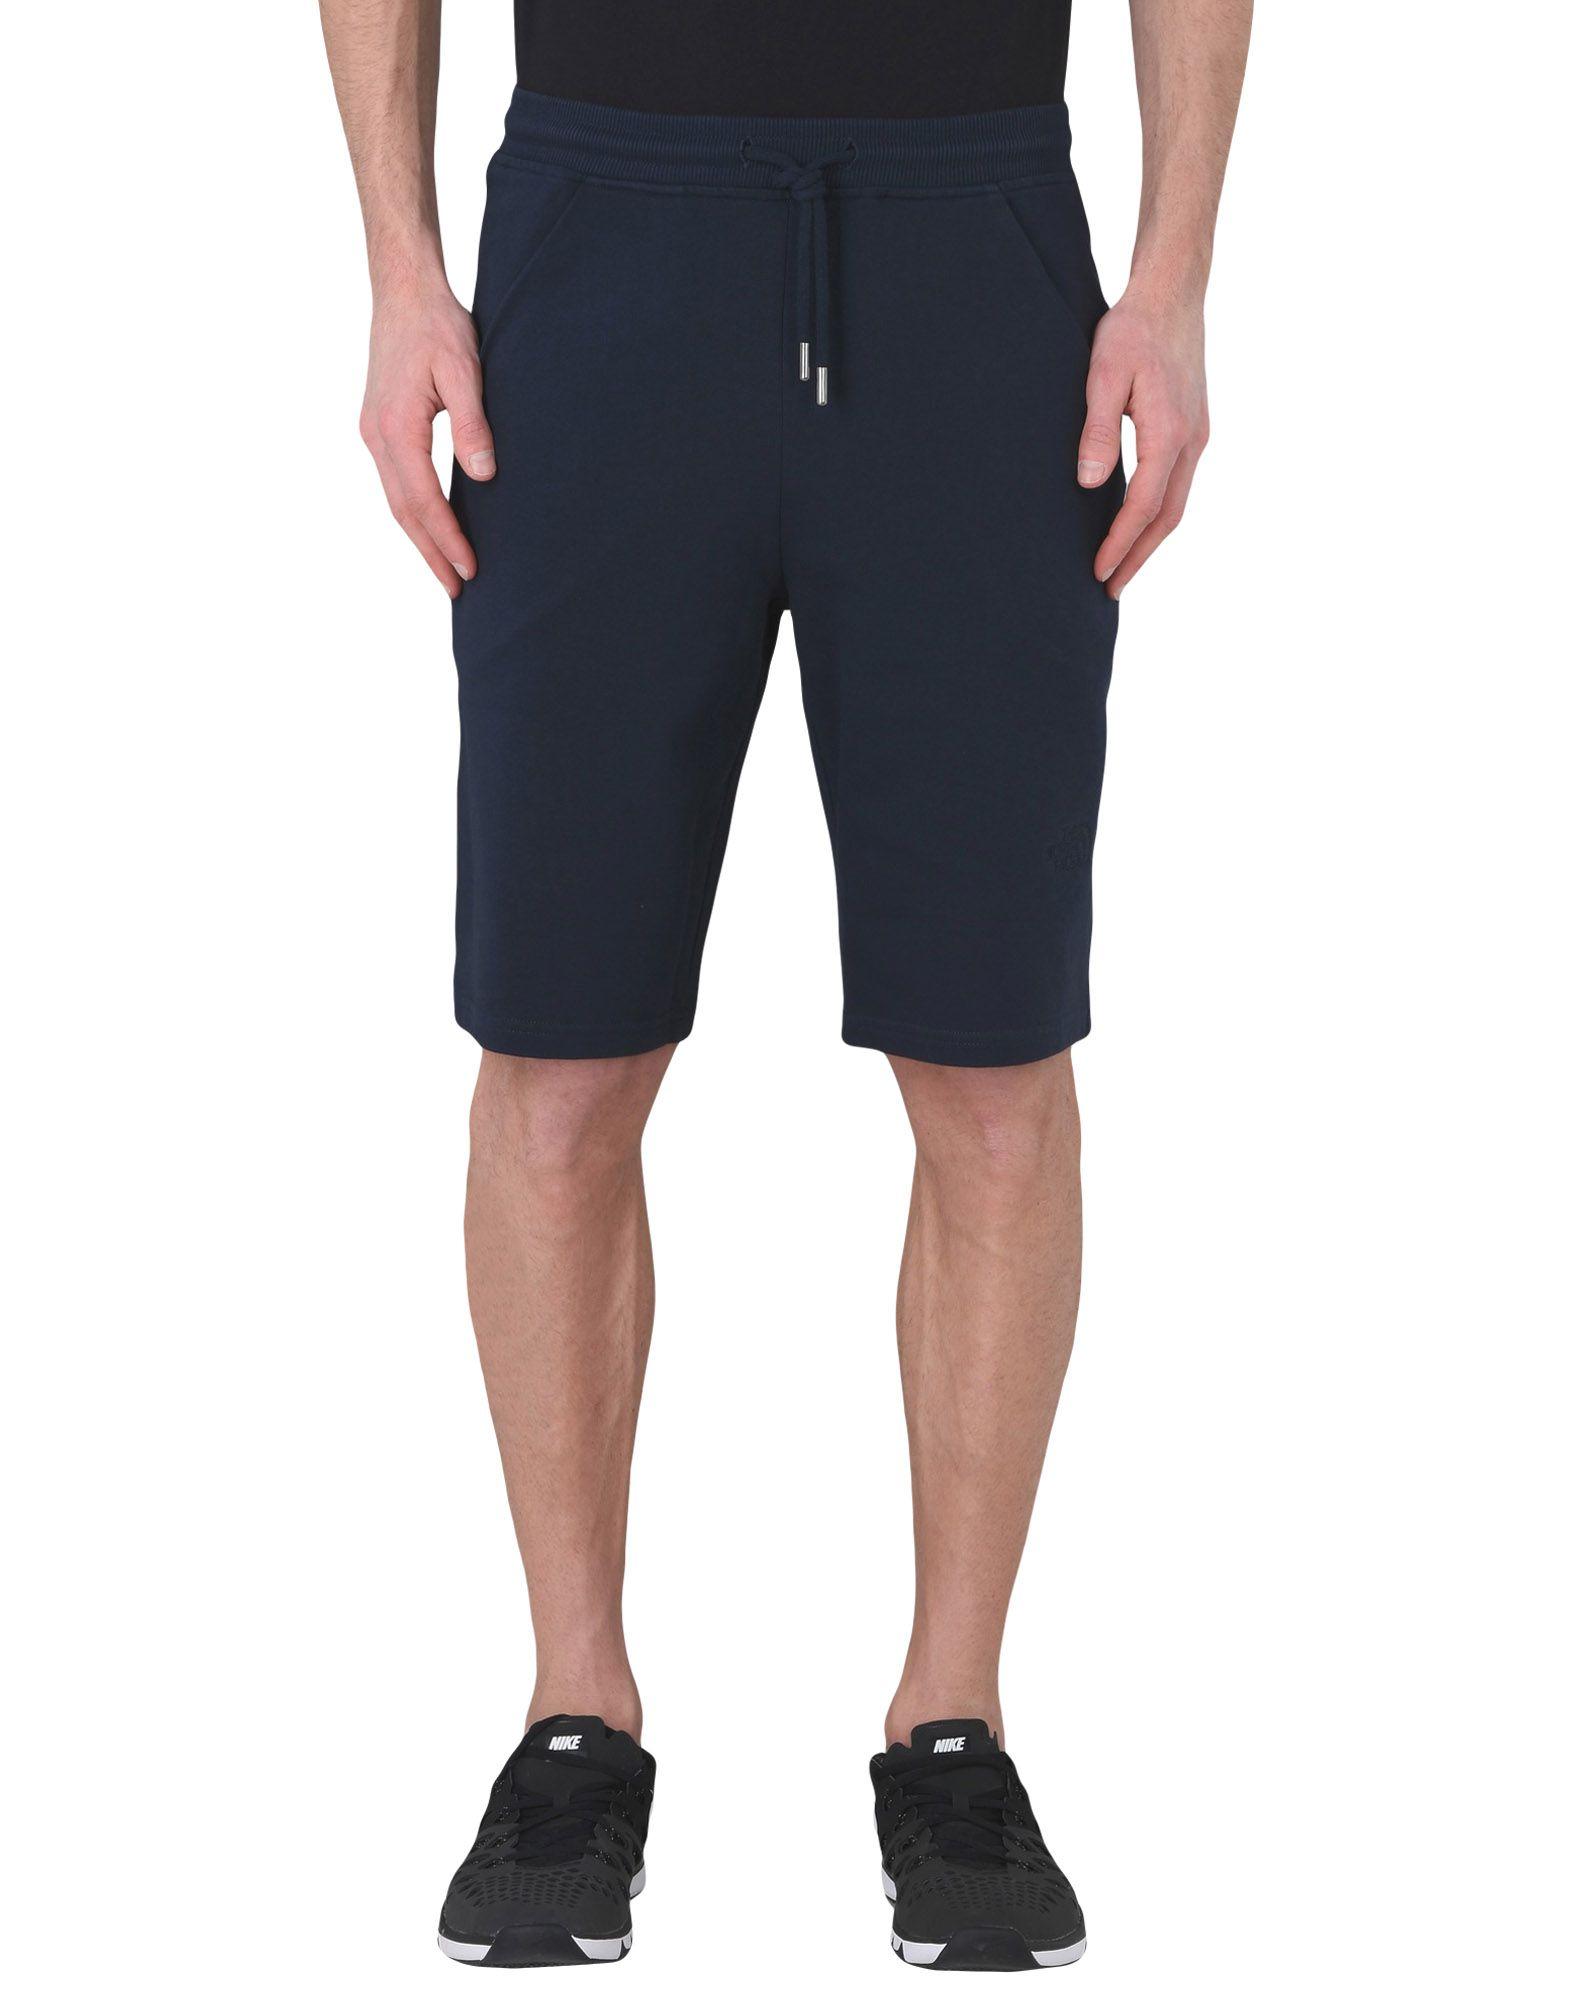 Pantalone Felpa The North Face M L/B Fleece Urban Short Urban Fleece Navy - Uomo - 13178106XC f9cf25